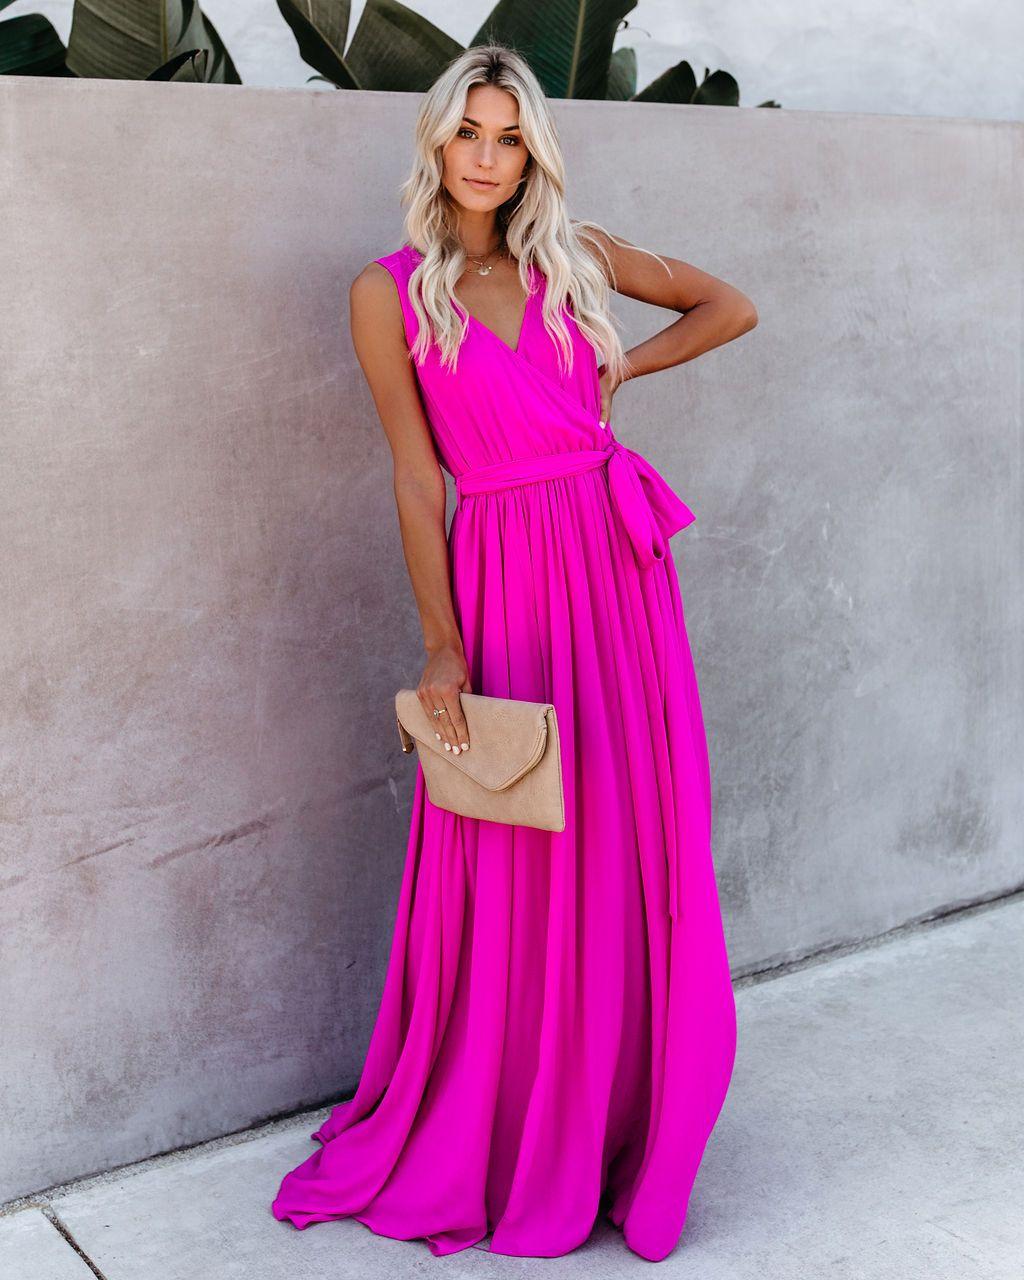 Diana Sleeveless Maxi Dress Fuchsia Vici Fashion Beautiful Outfits Maxi Dress [ 1280 x 1024 Pixel ]